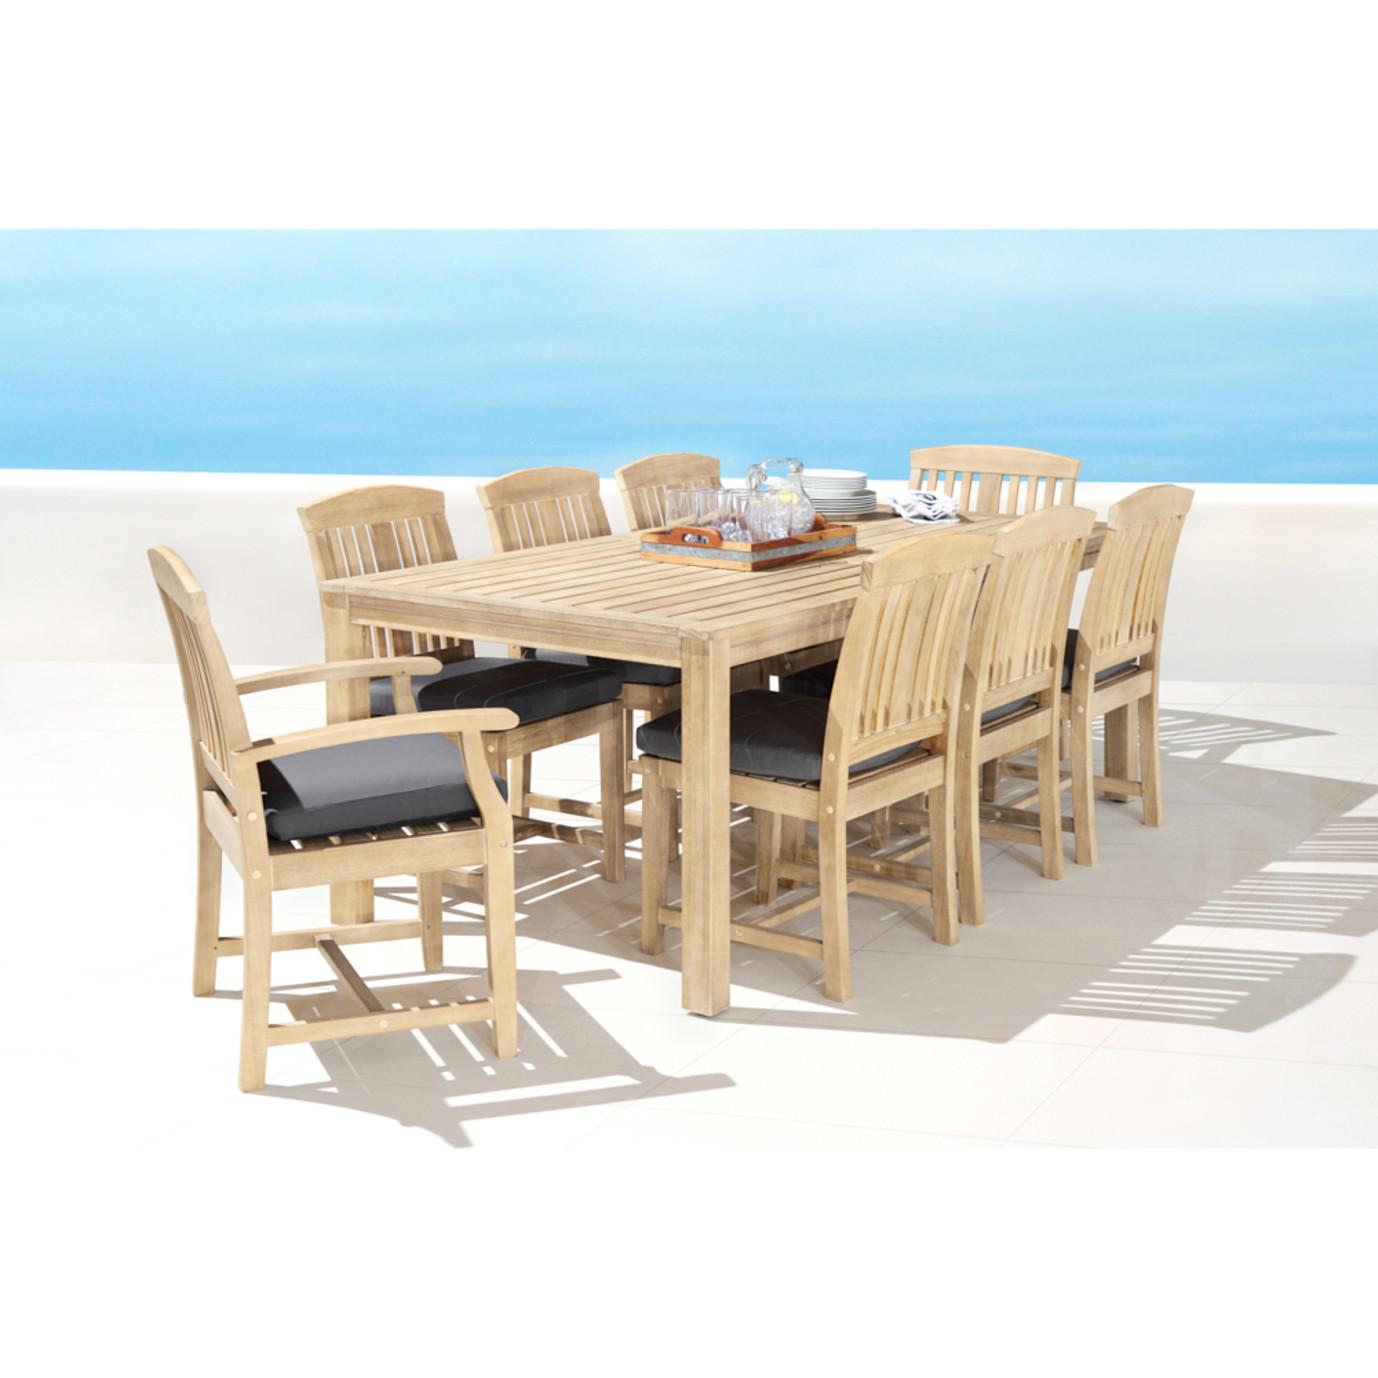 Kooper 9pc Outdoor Dining Set - Charcoal Gray